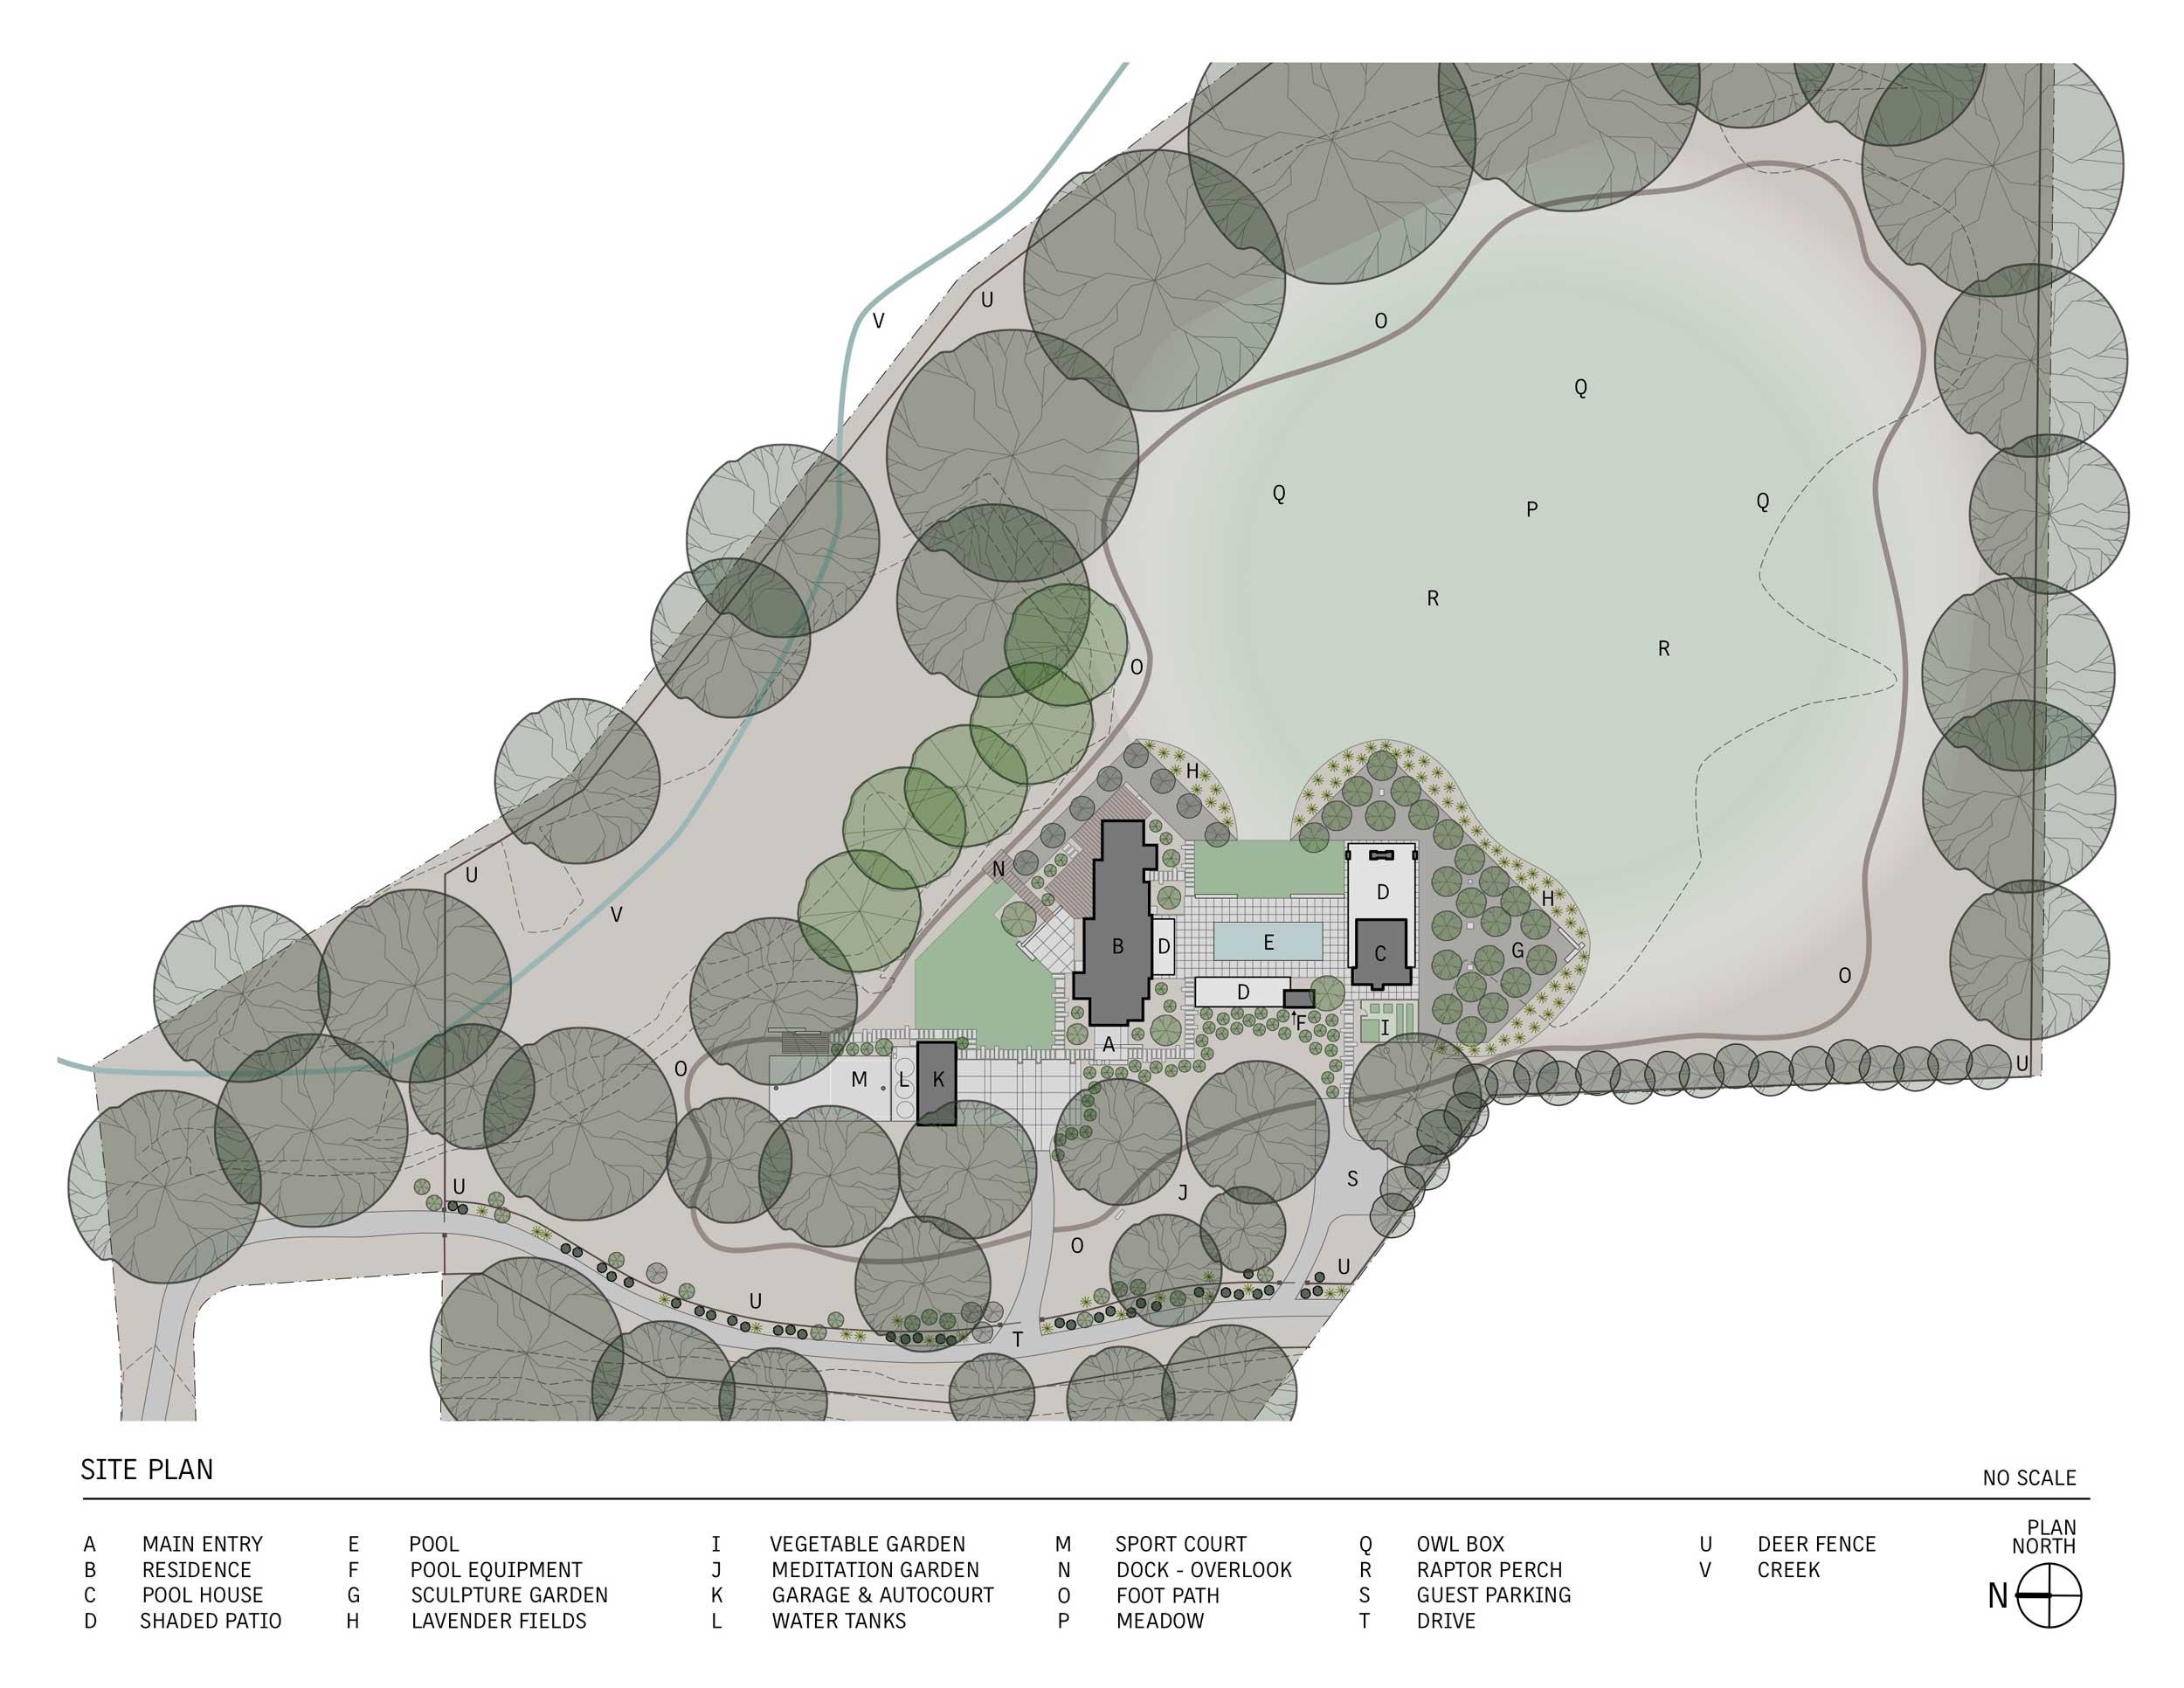 Copy of Site Plan